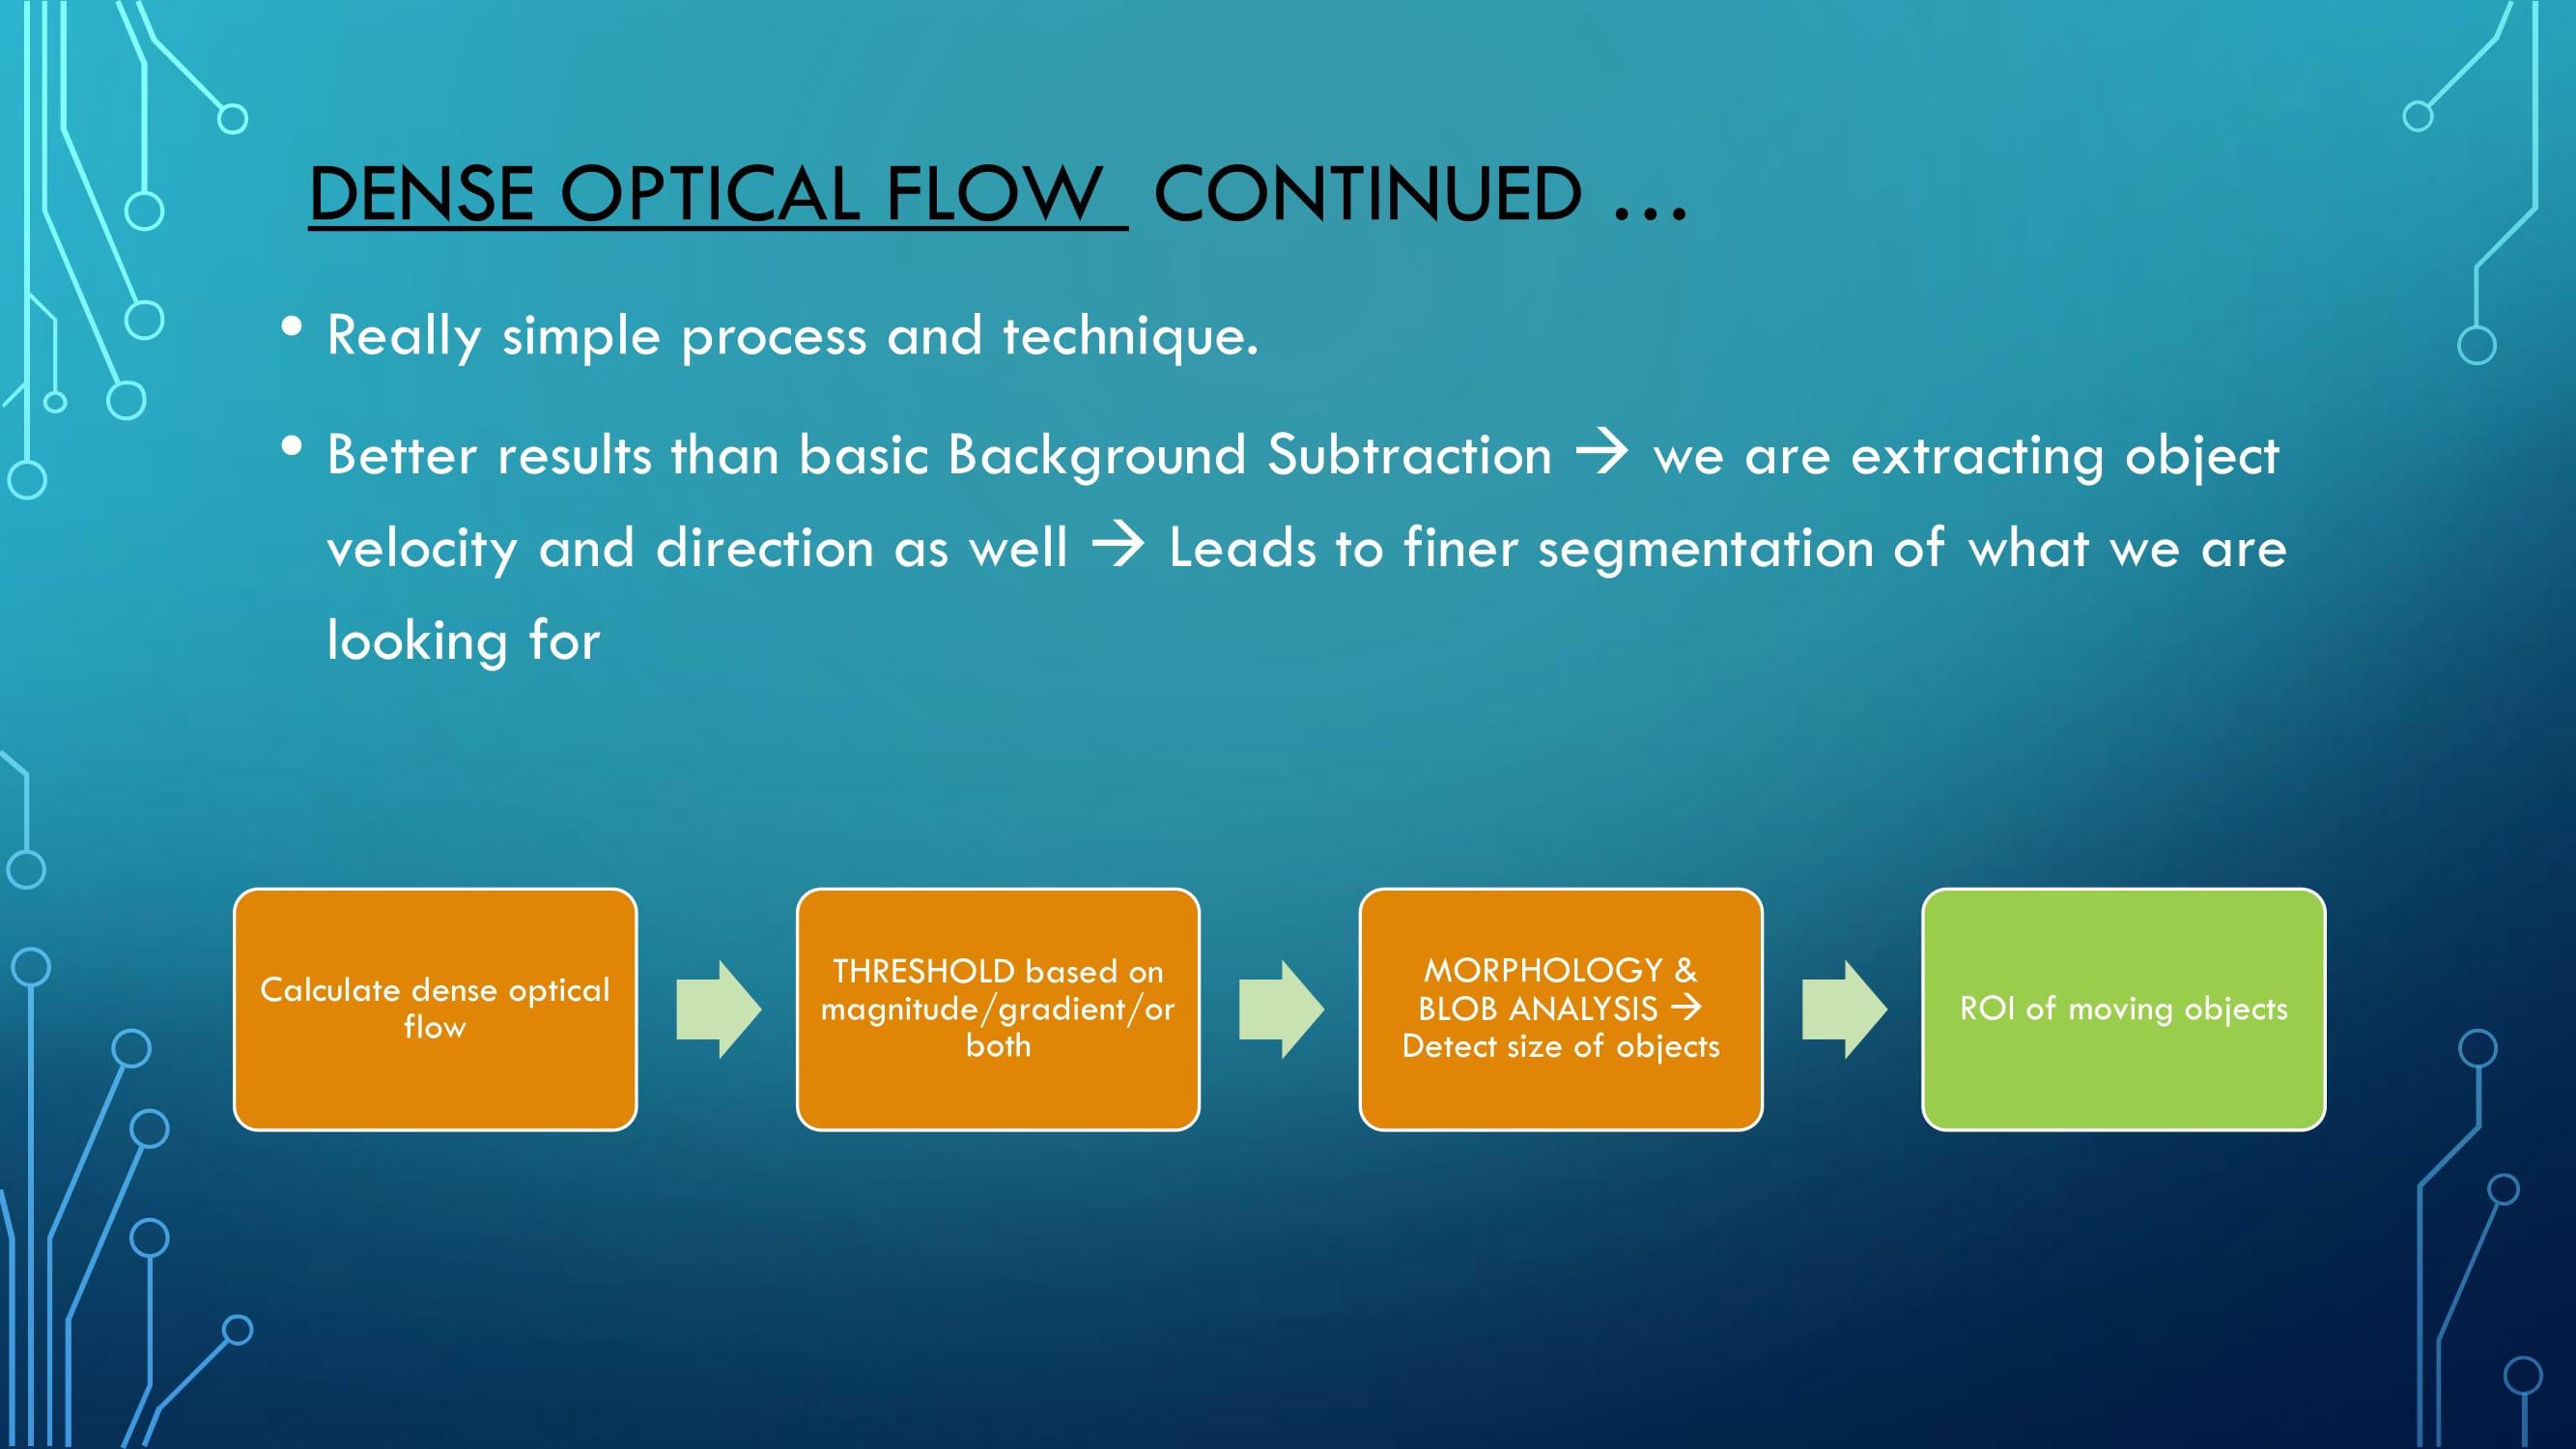 Dense OpticalFlow based motion segmentation and CNN-based Object